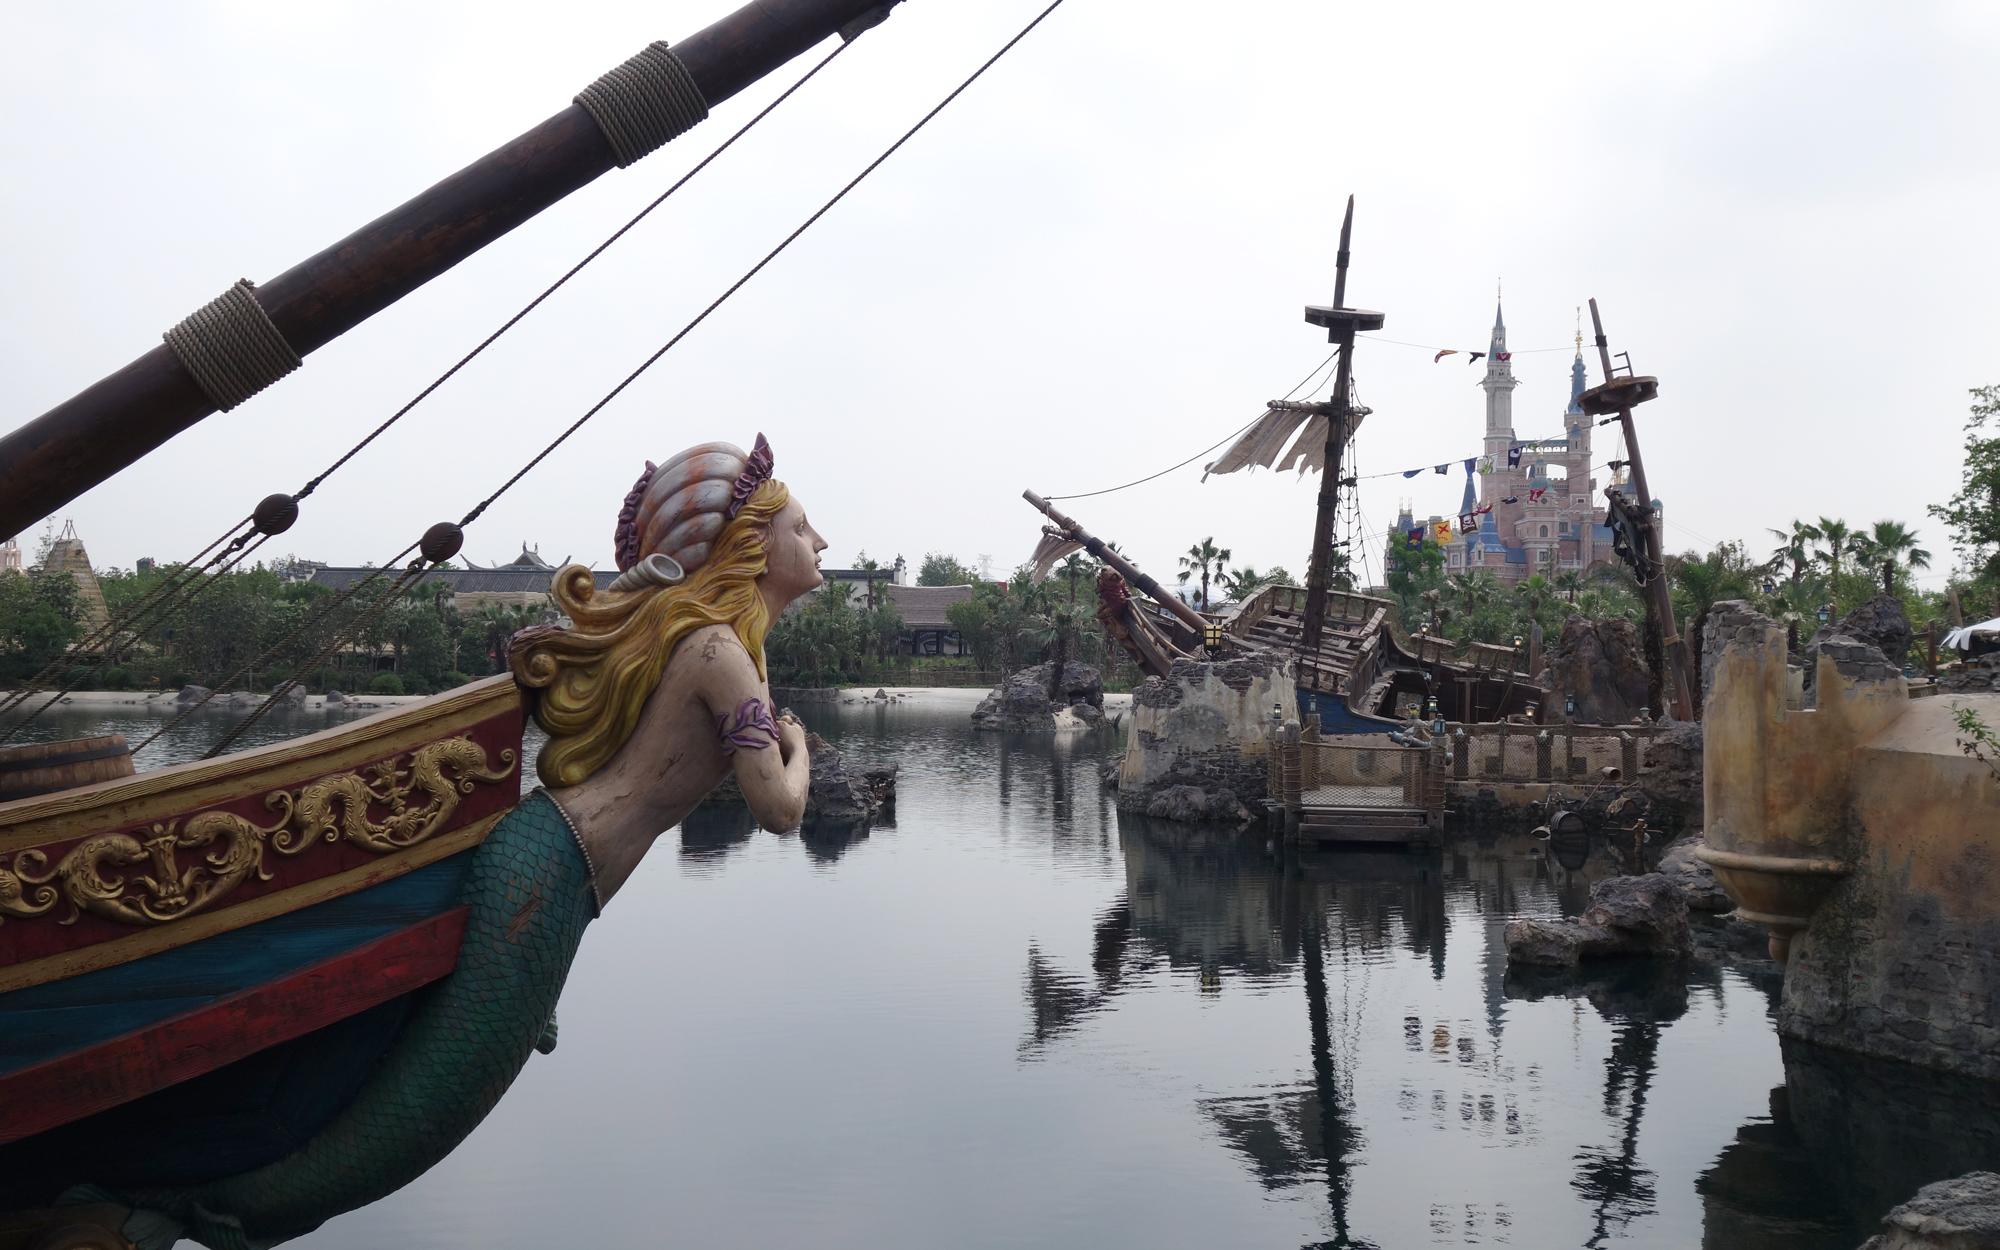 Shanghai-Disney-Scenes-05-EXCLUSIVE0616